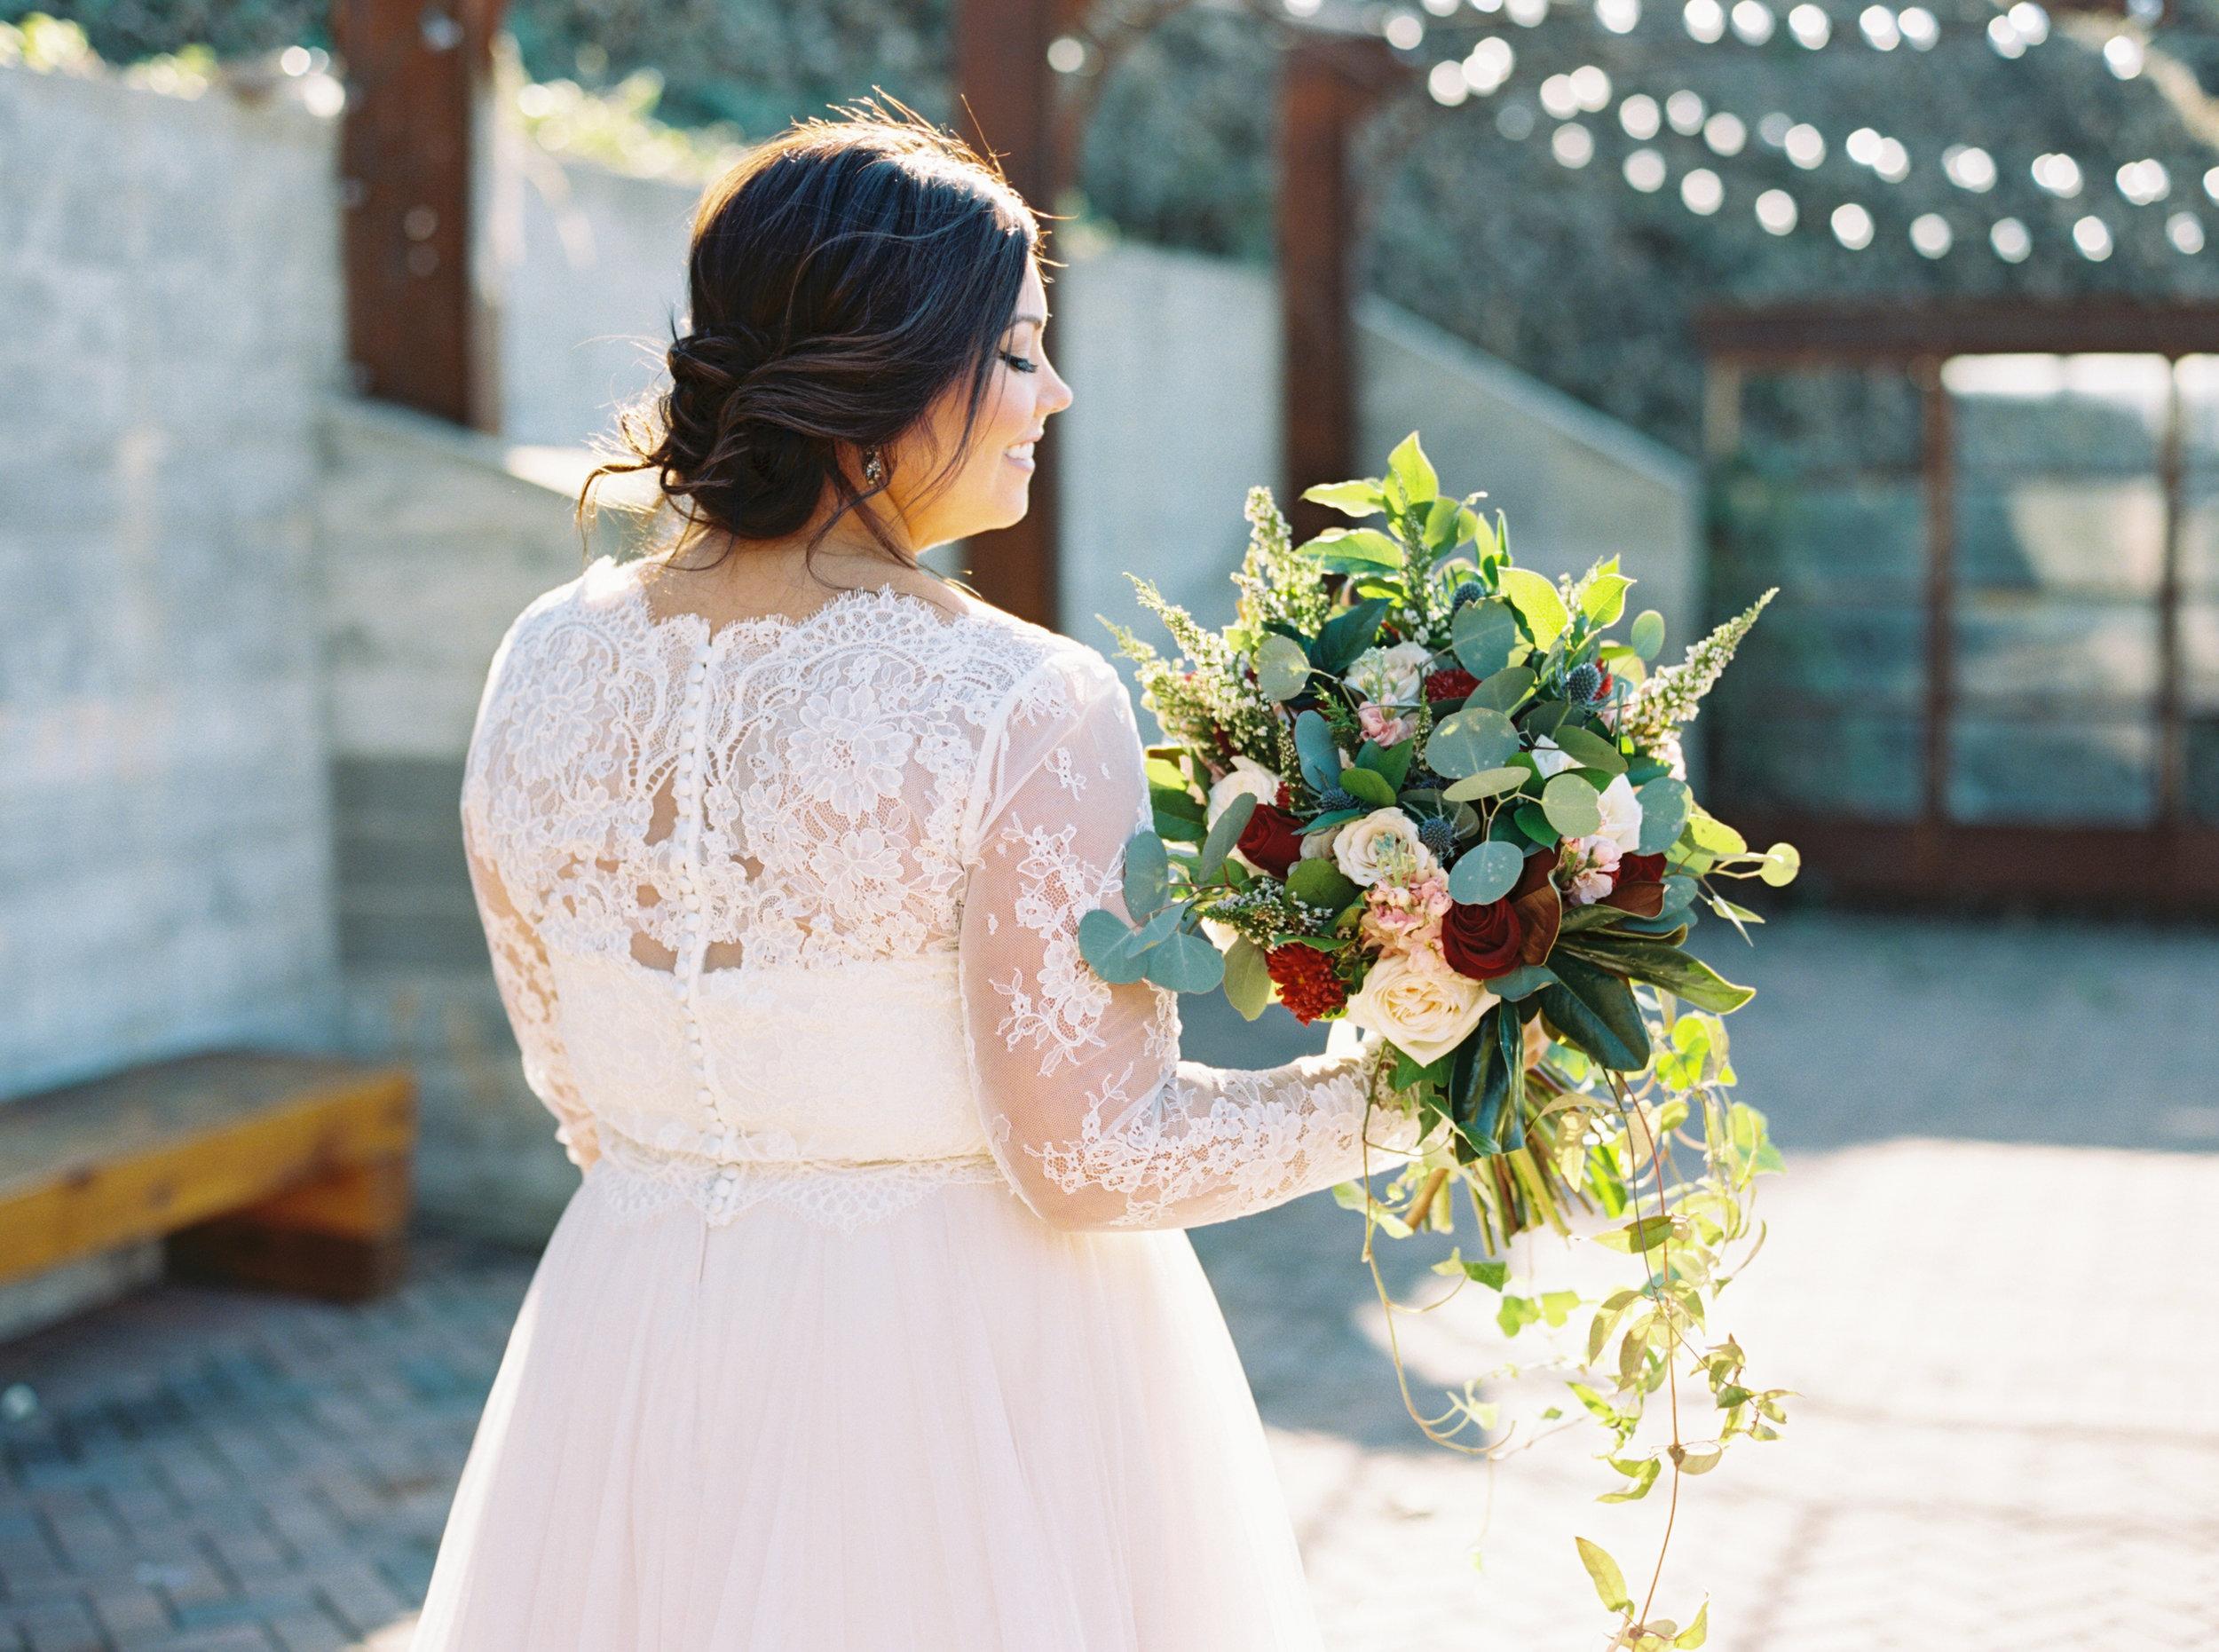 Lauren_Jeremy_Standard_Wedding_Knoxville_Abigail_Malone_Photography_FIlm-235.jpg